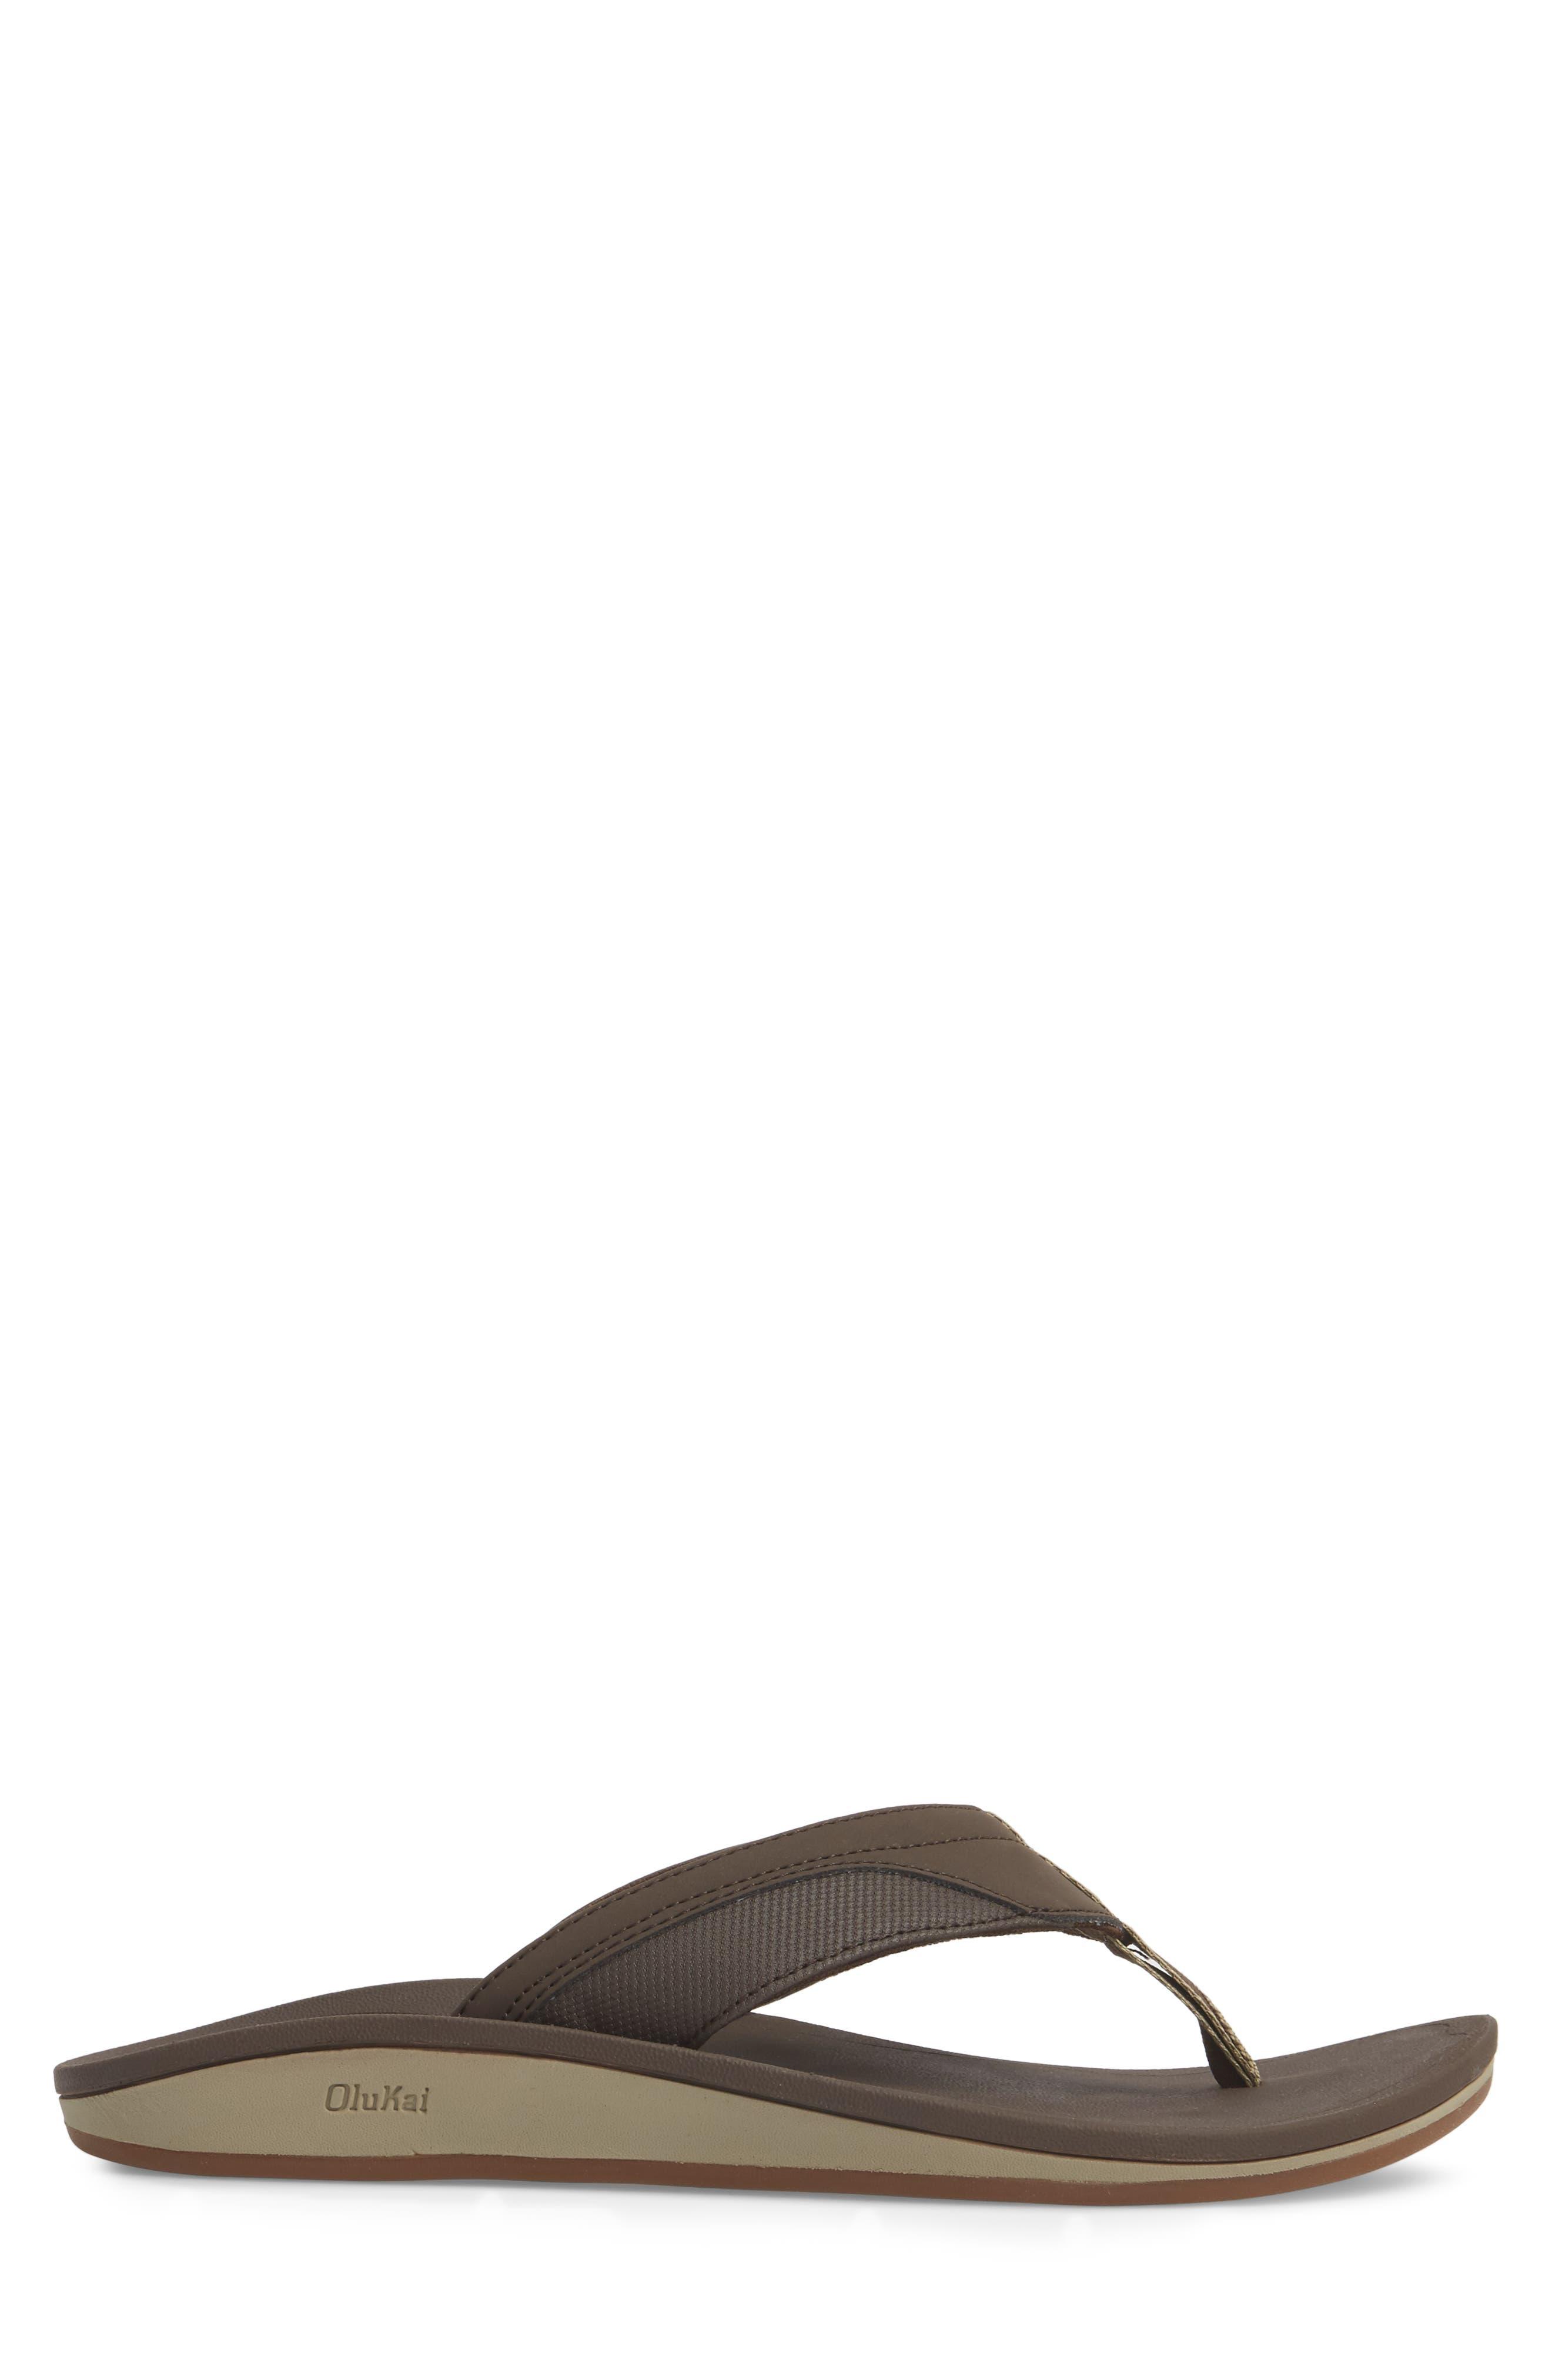 Nohona Flip Flop,                             Alternate thumbnail 3, color,                             Dark Wood/ Dark Wood